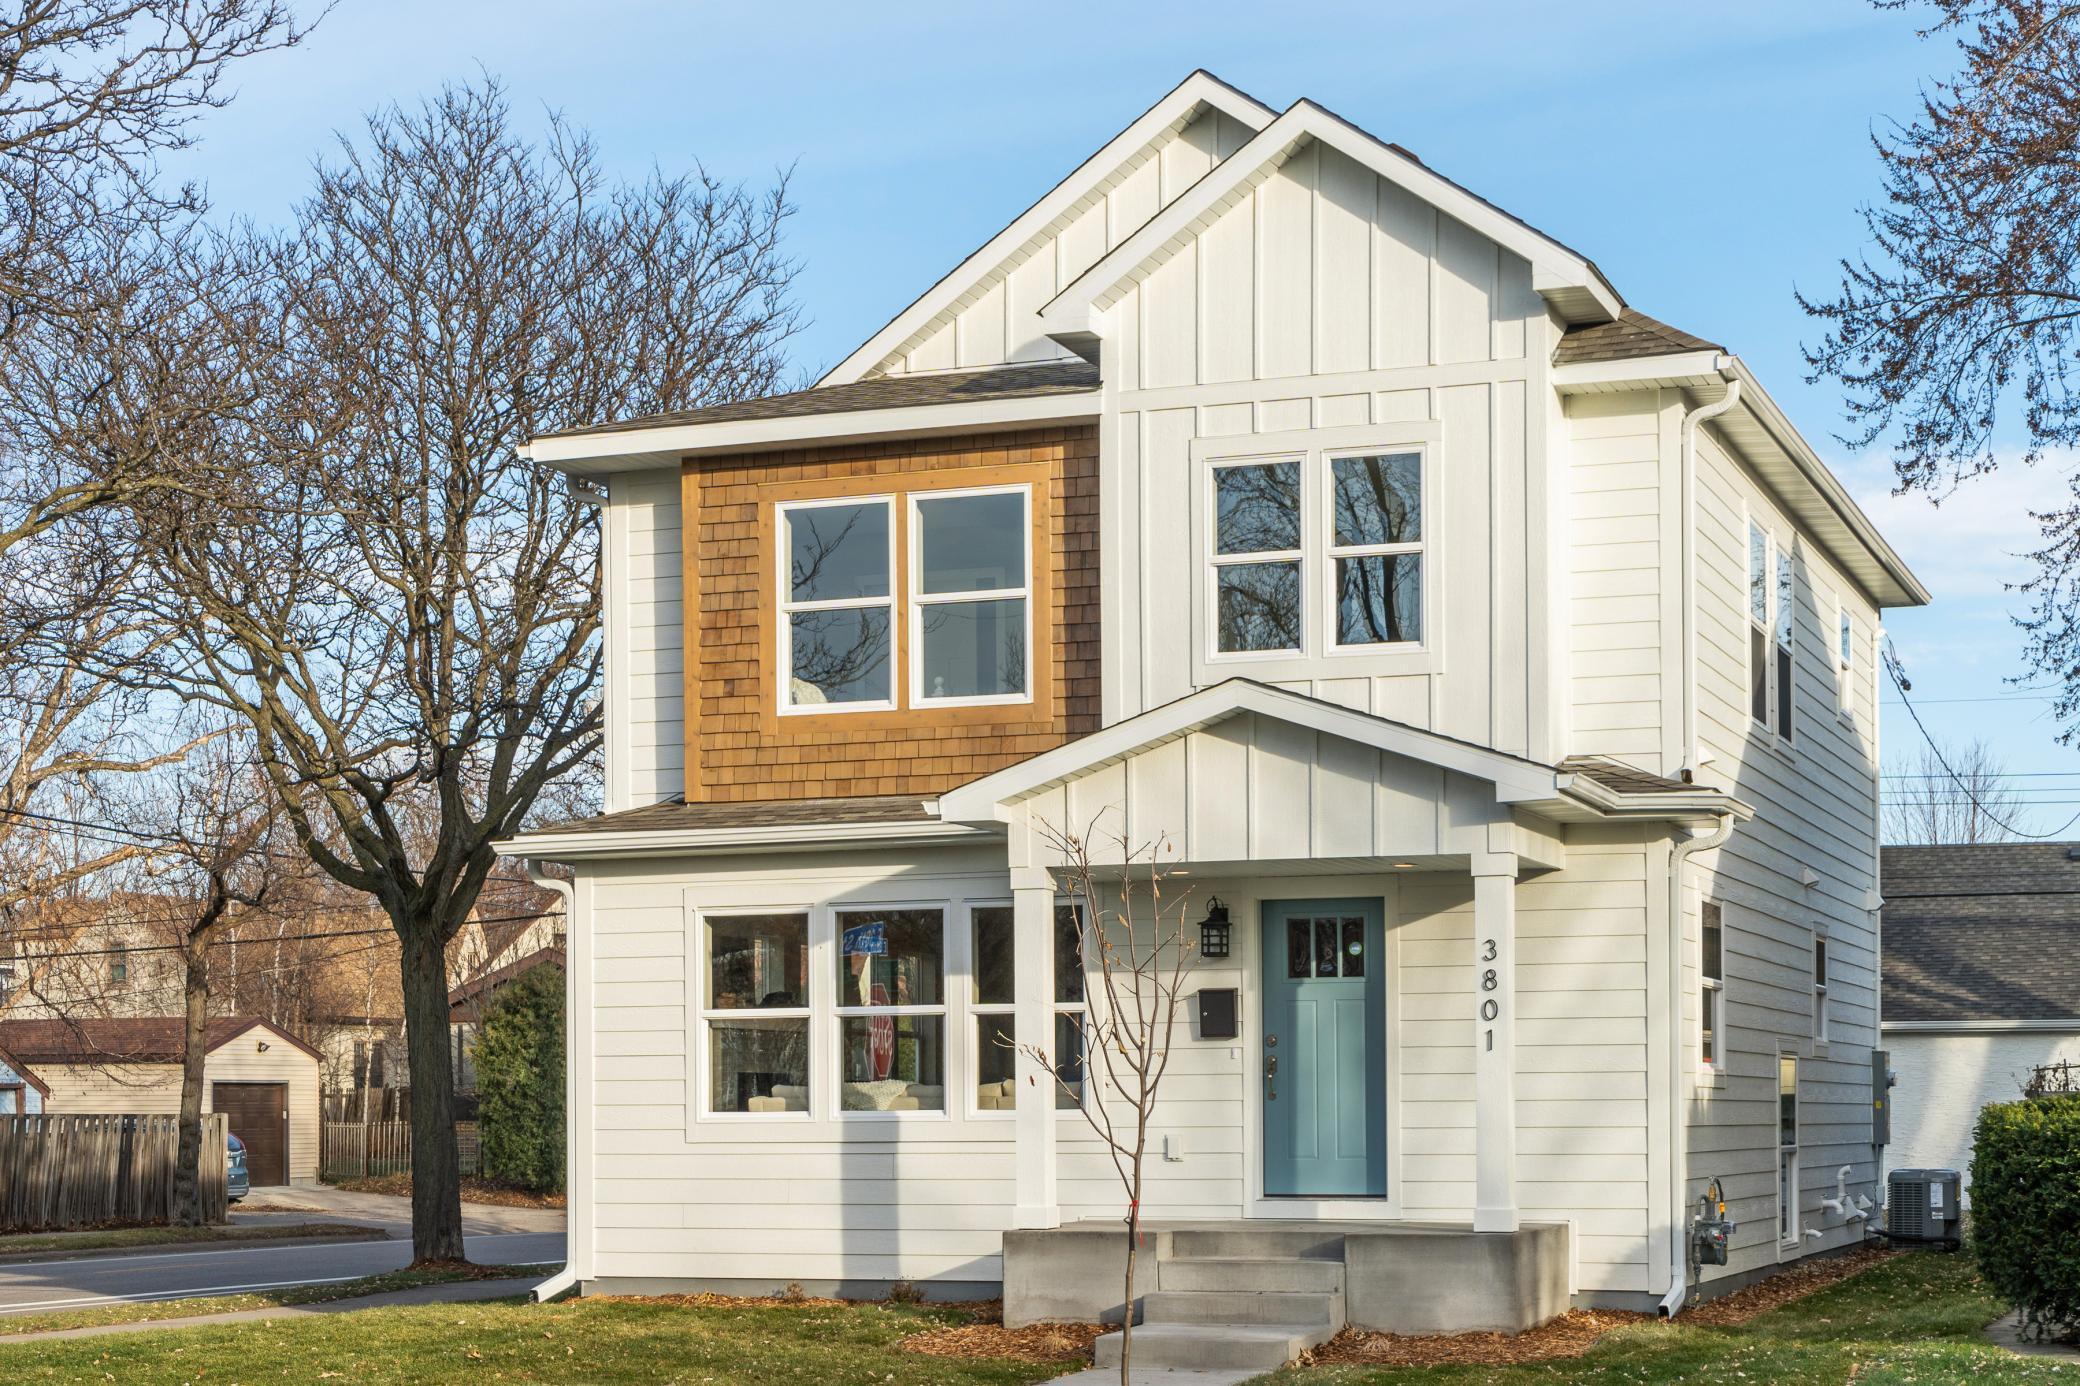 3801 44th Avenue S Property Photo - Minneapolis, MN real estate listing